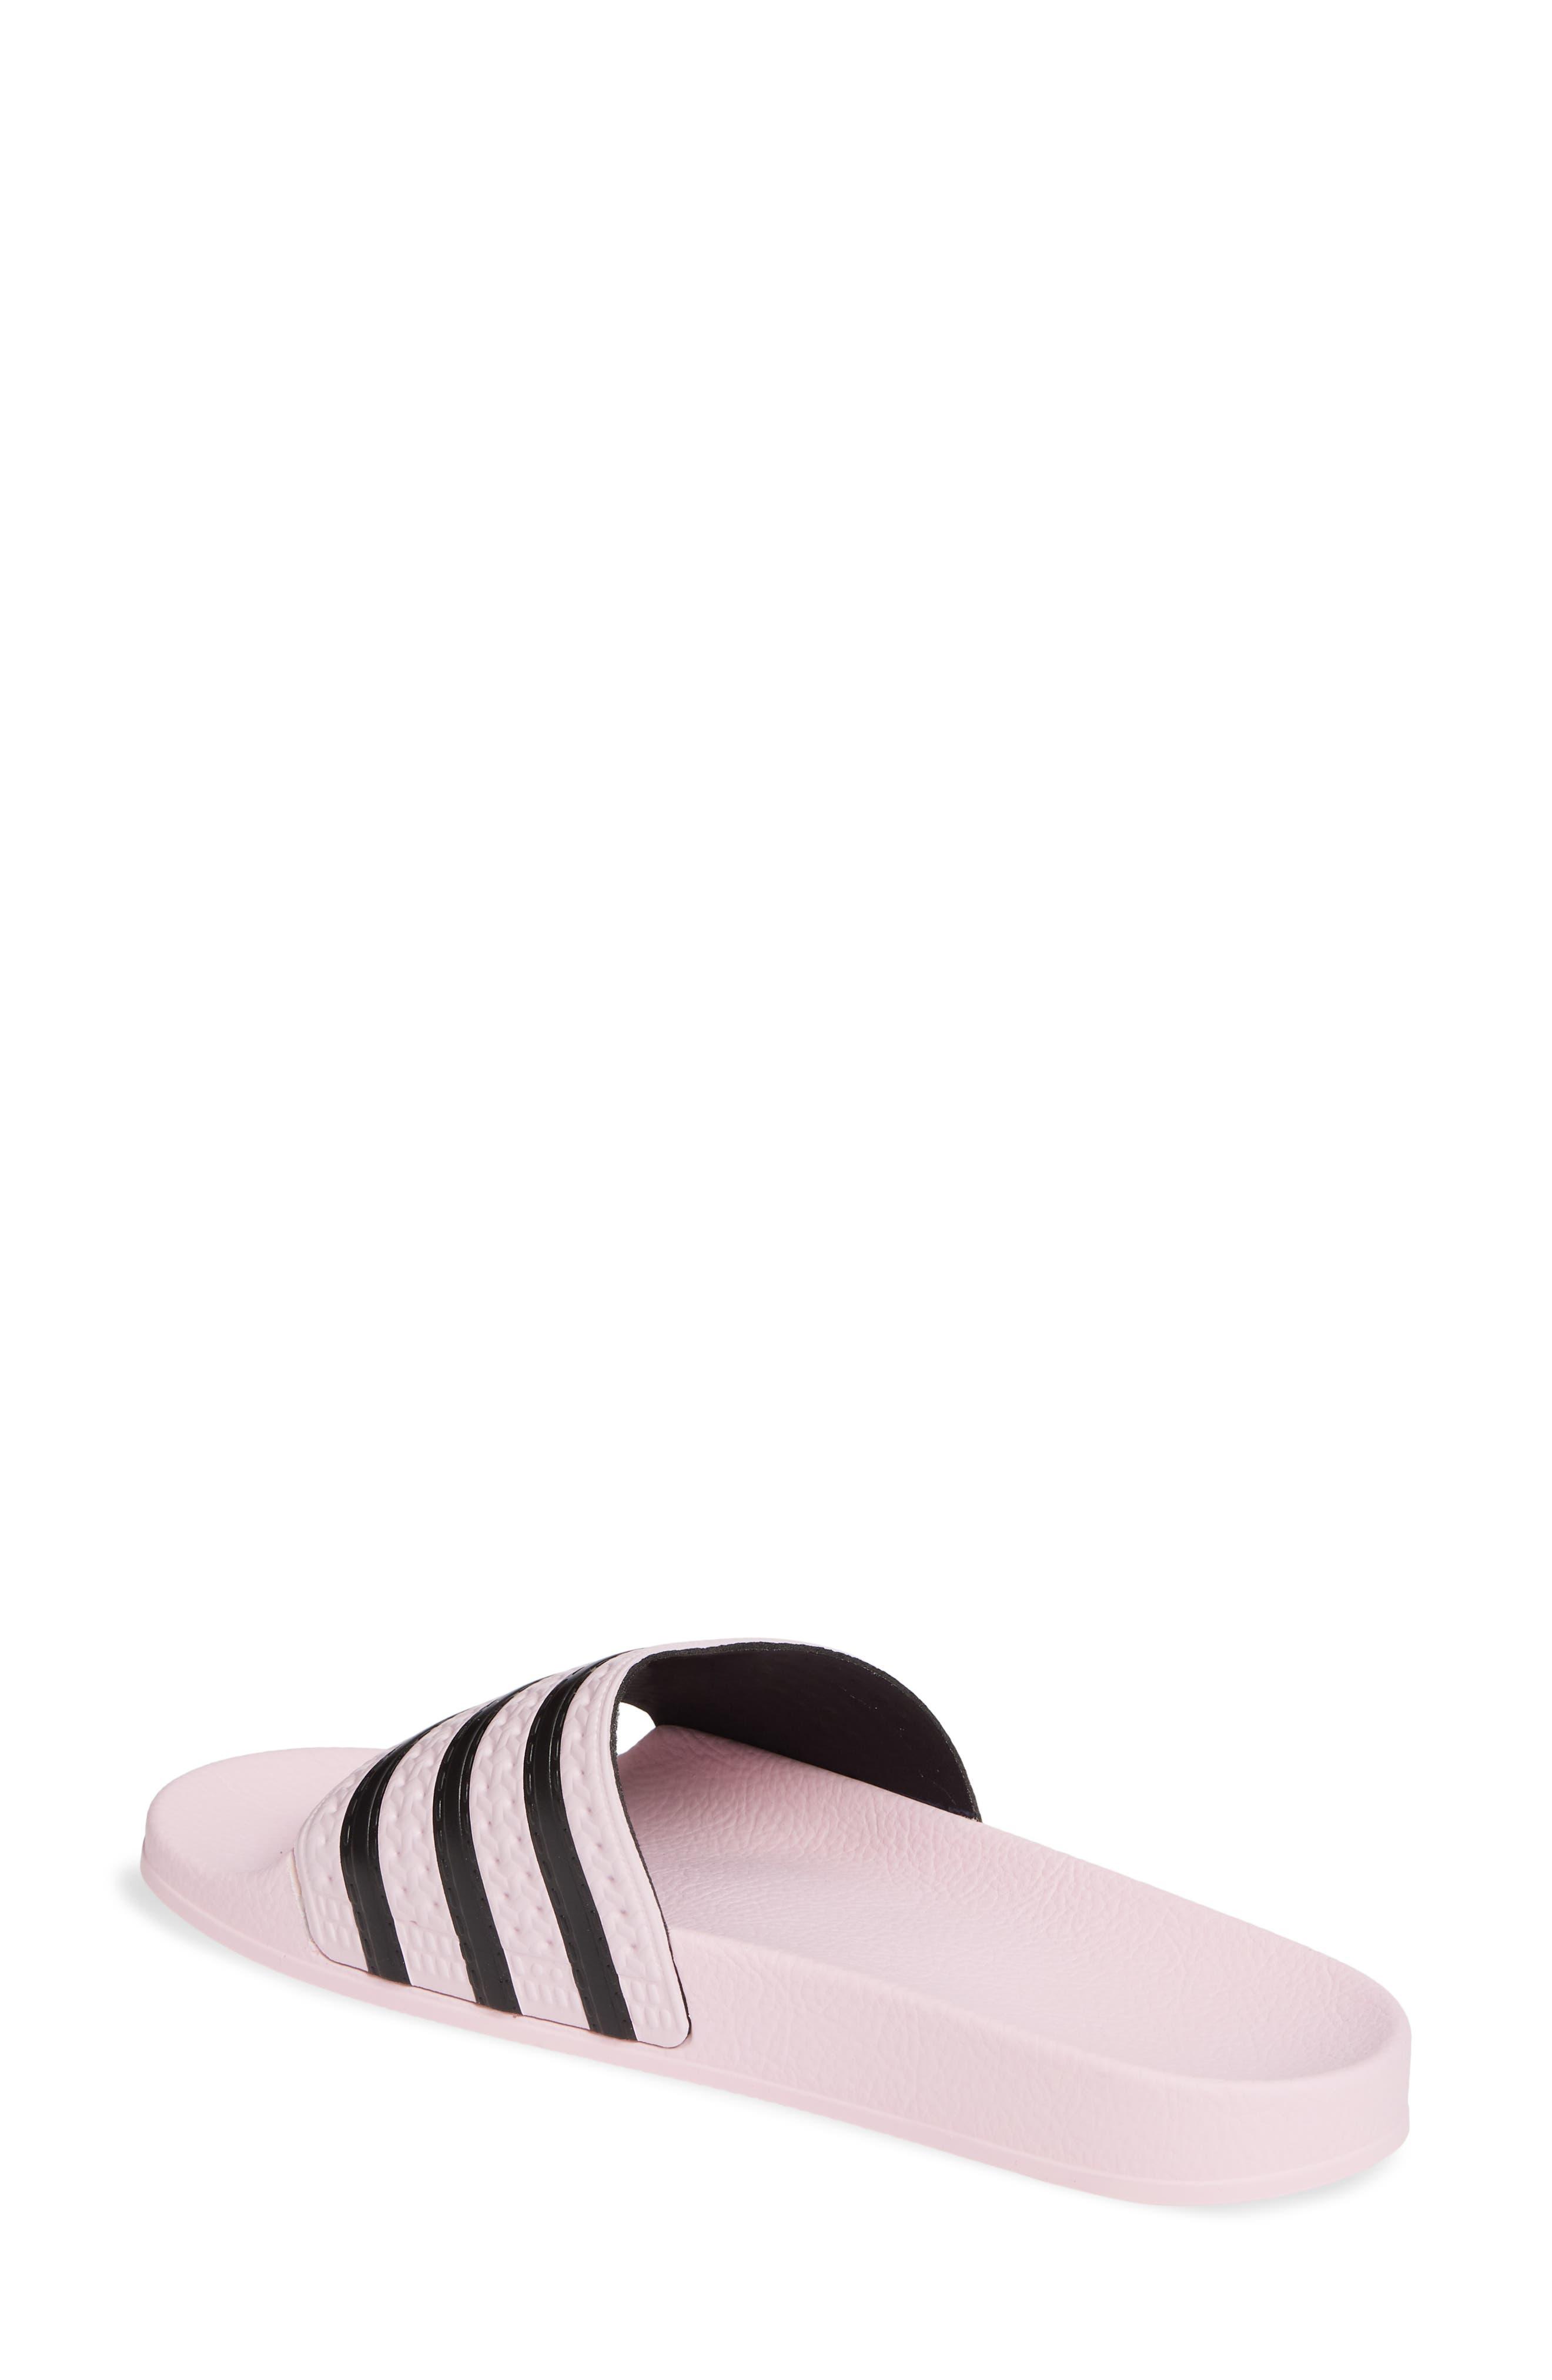 33f06f9a441 Women s Pink Mules   Slides